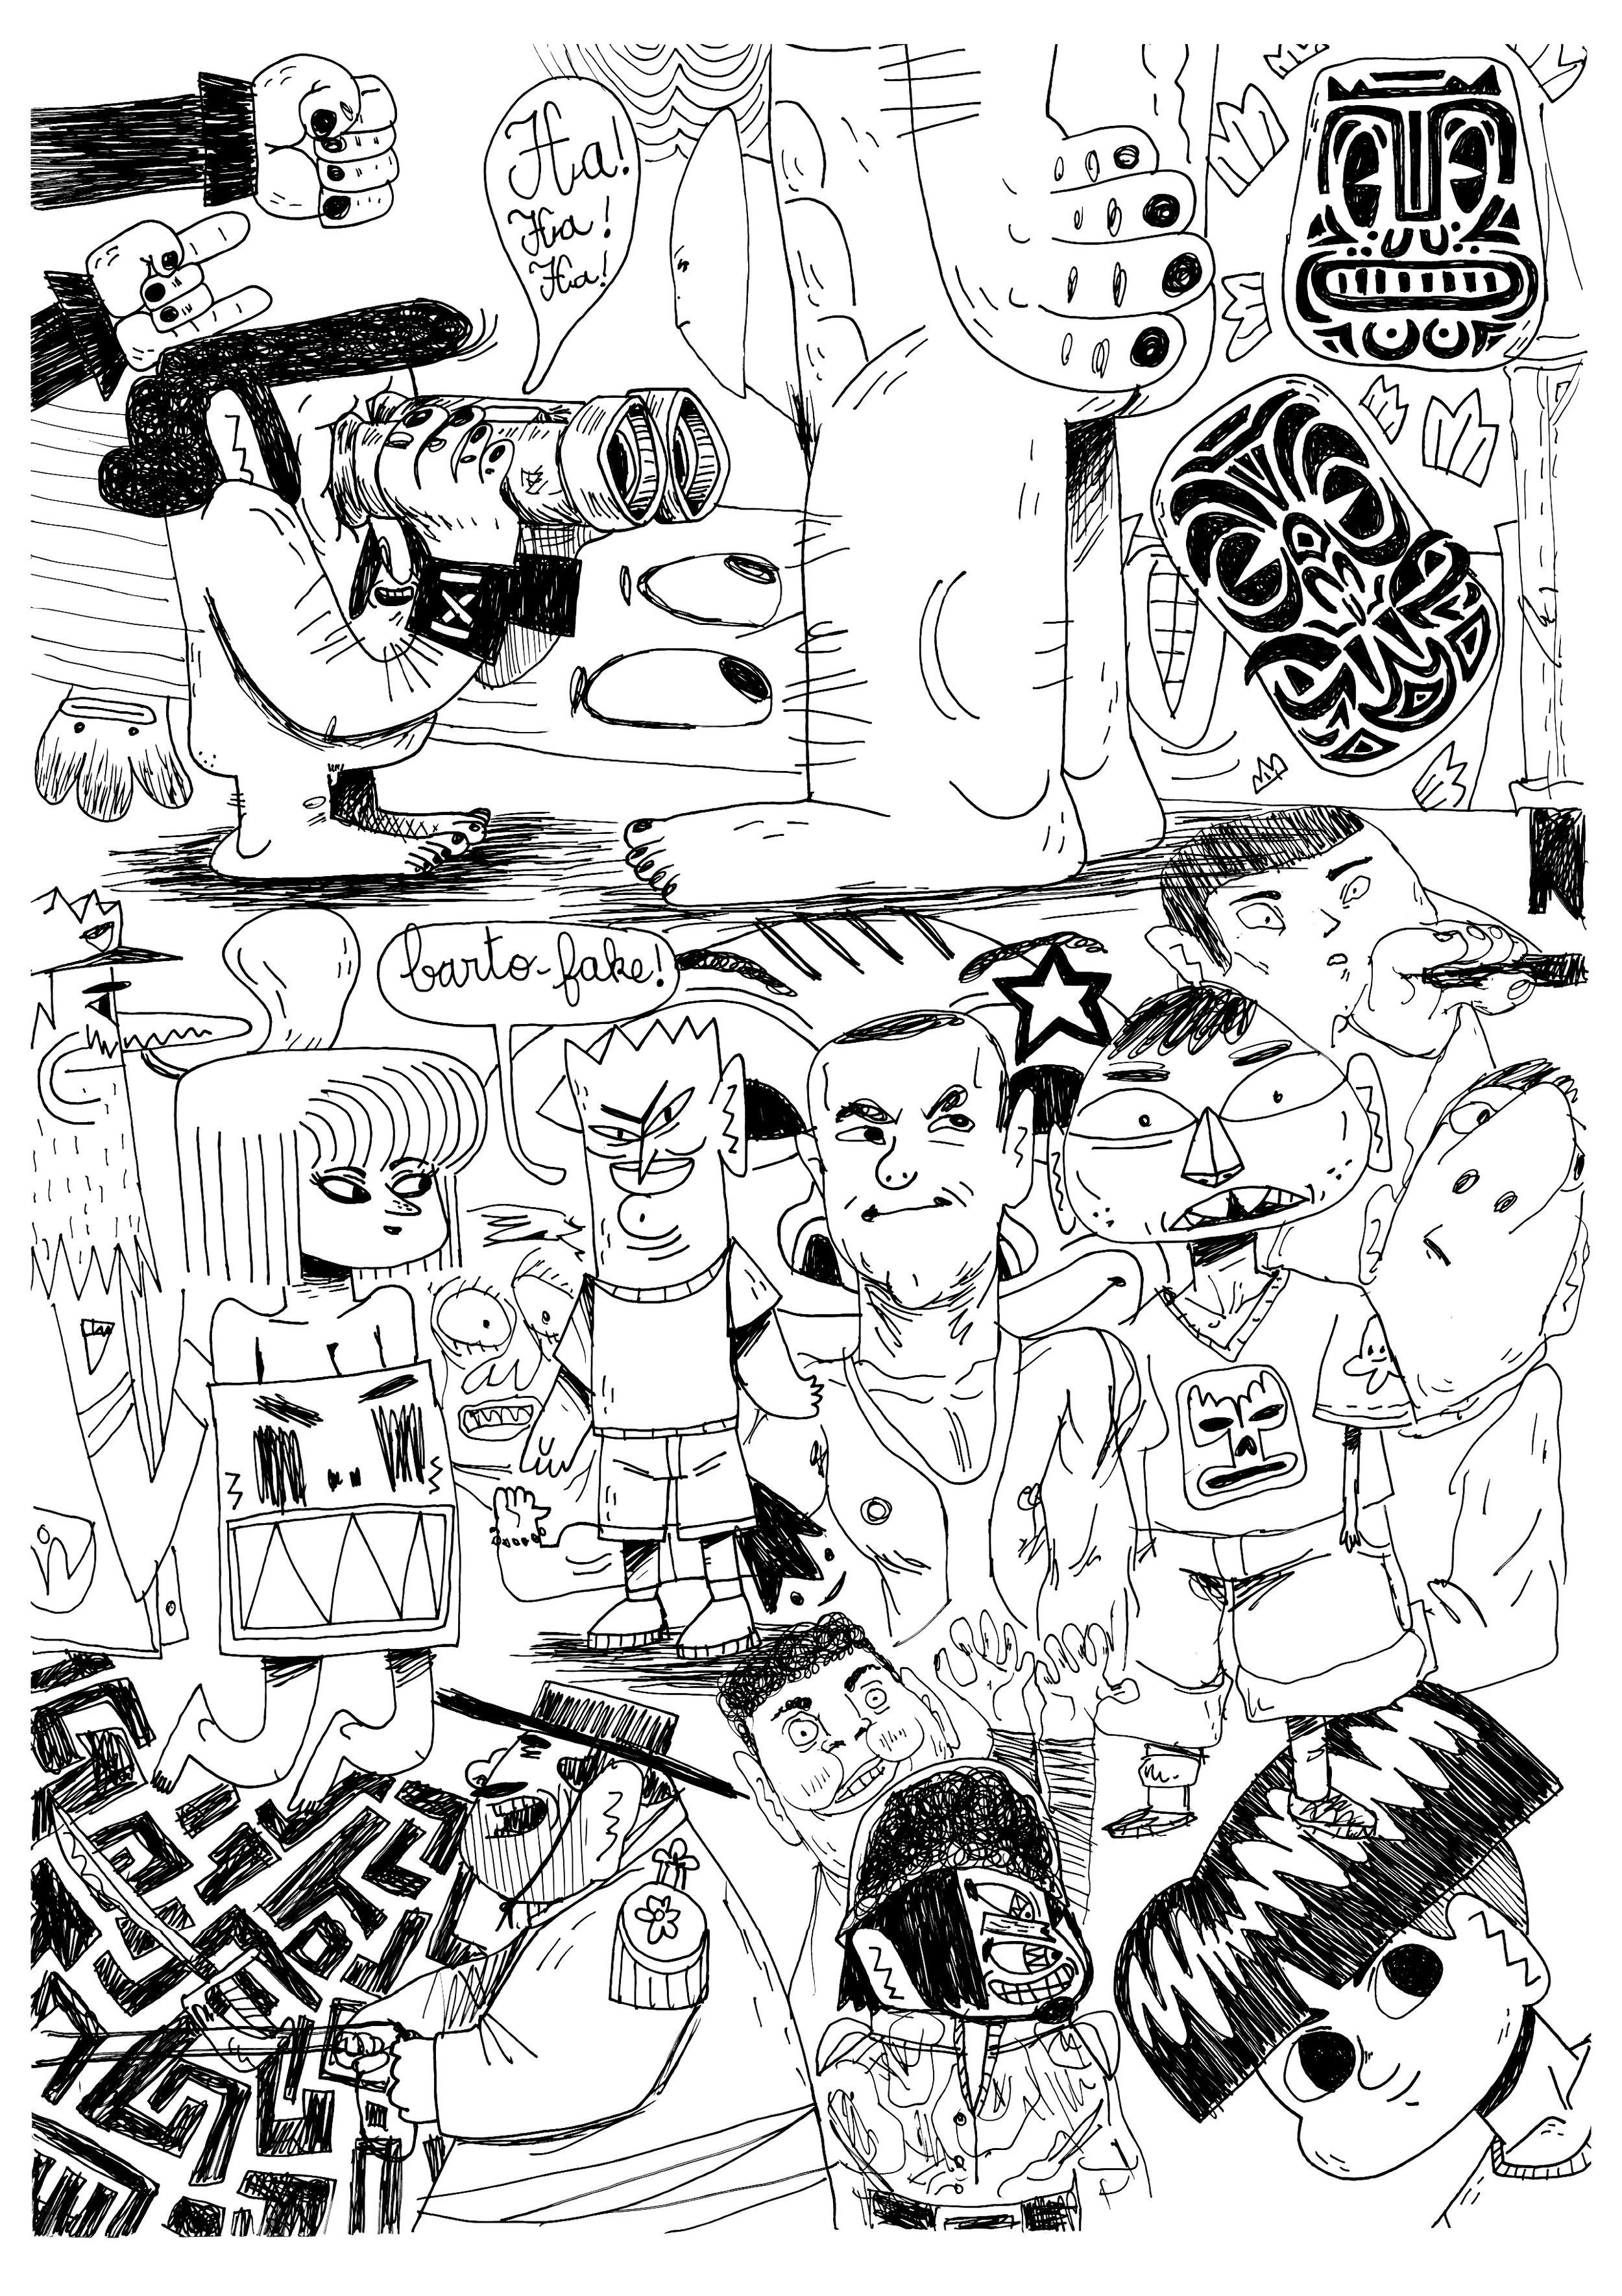 Pascal_Zaffiro_Doodle_35.jpg